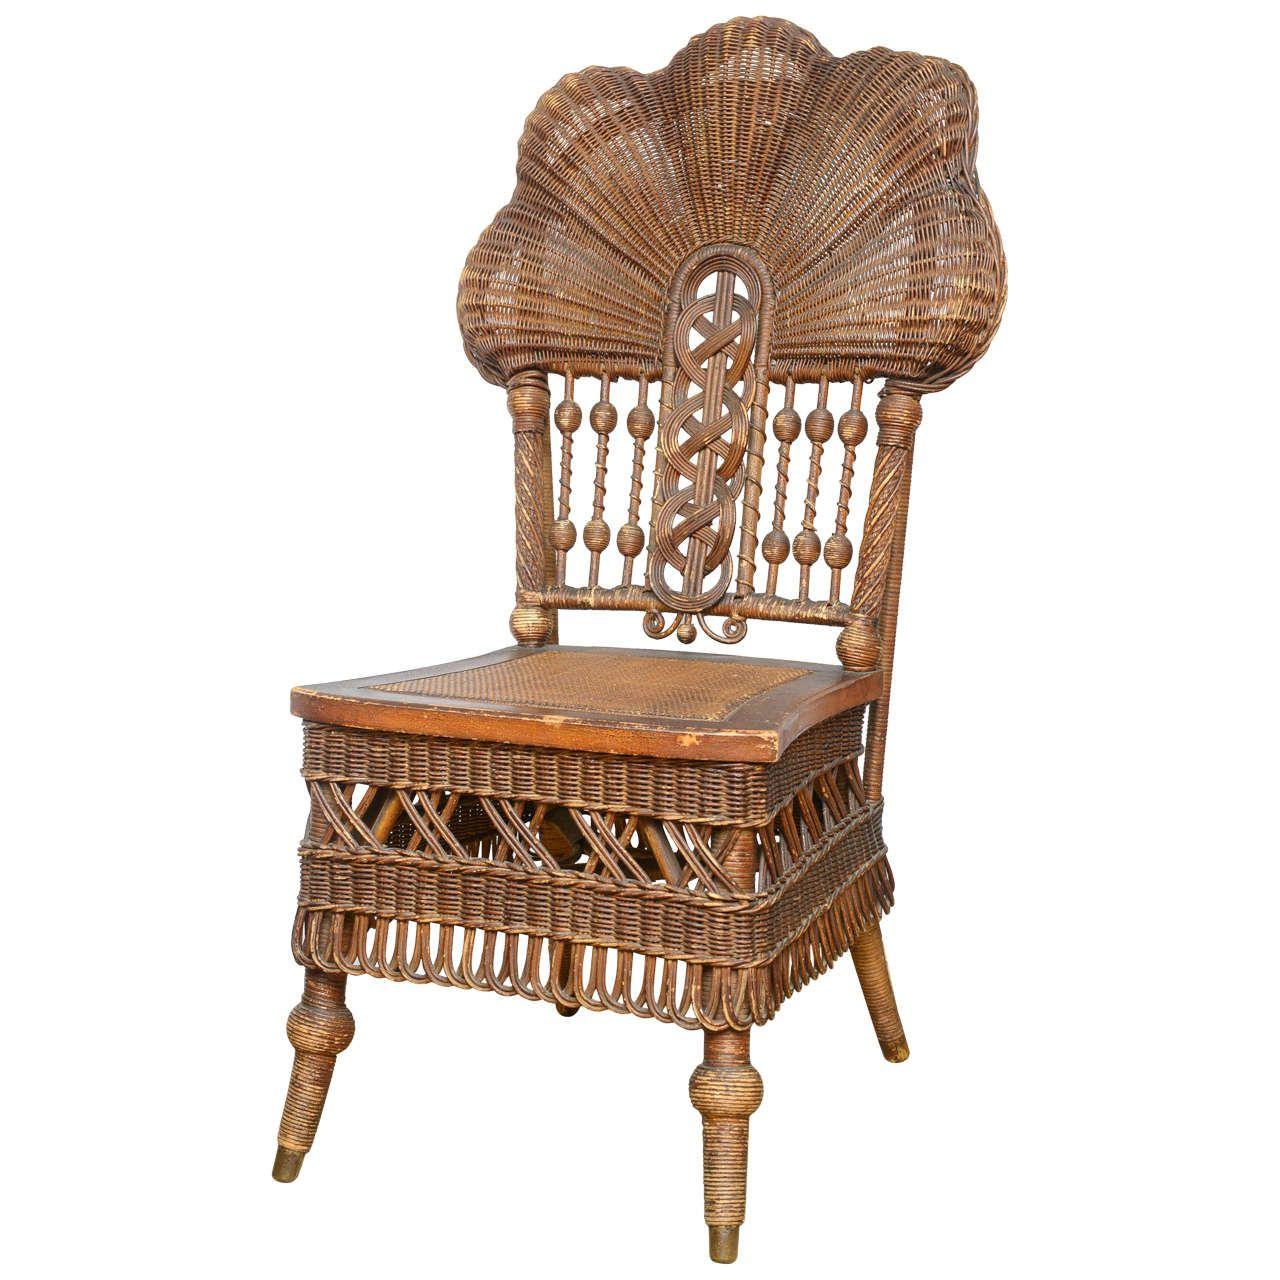 rare heywood-wakefield wicker chair | wicker chairs, wakefield and